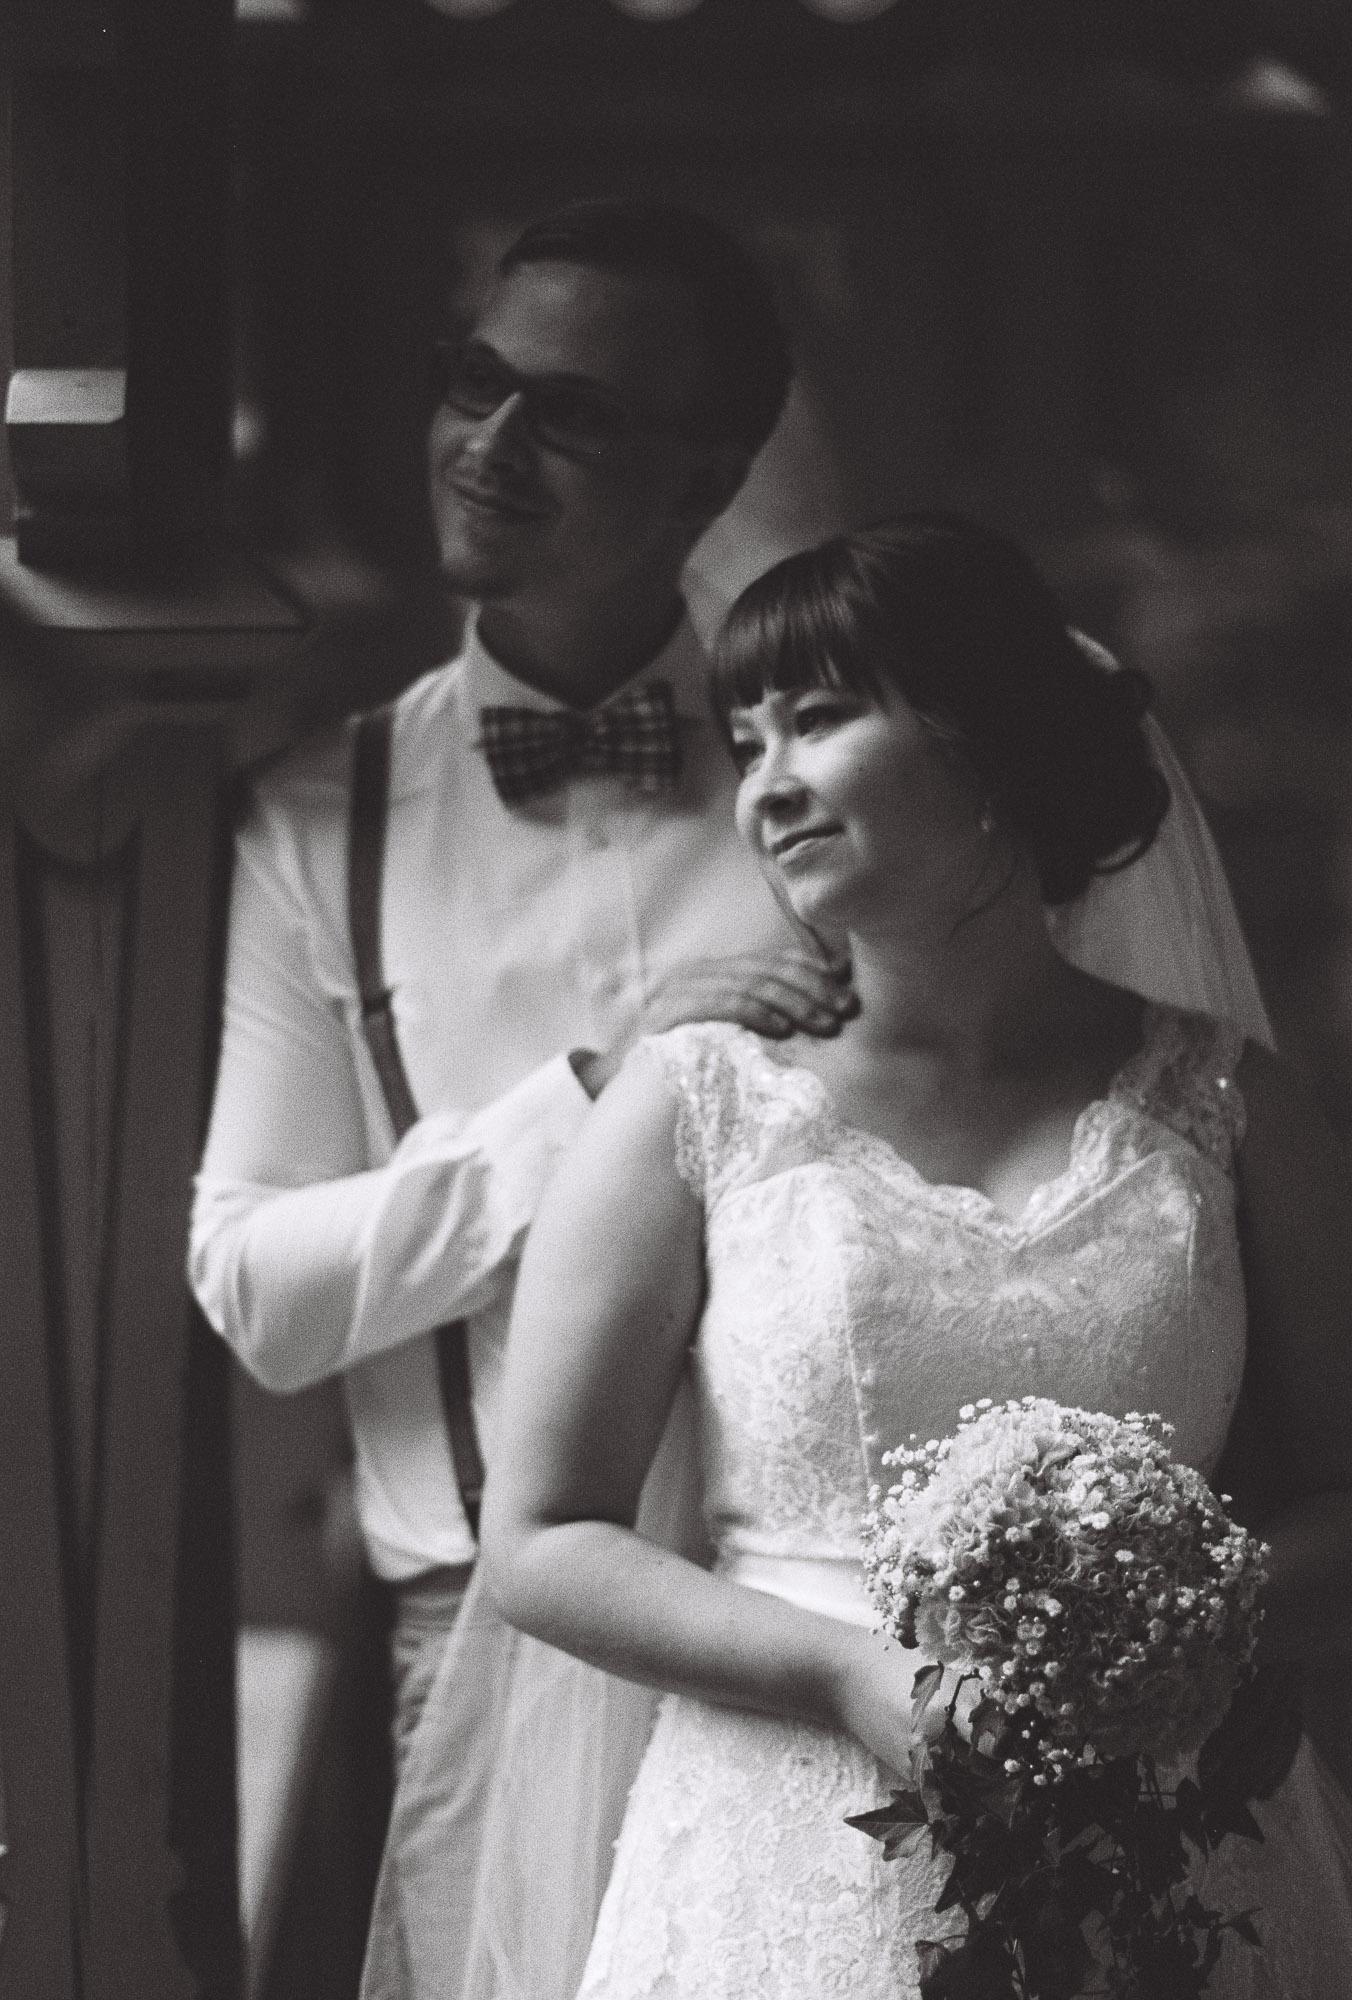 jere-satamo-analog-film-wedding-photographer-finland-111.jpg